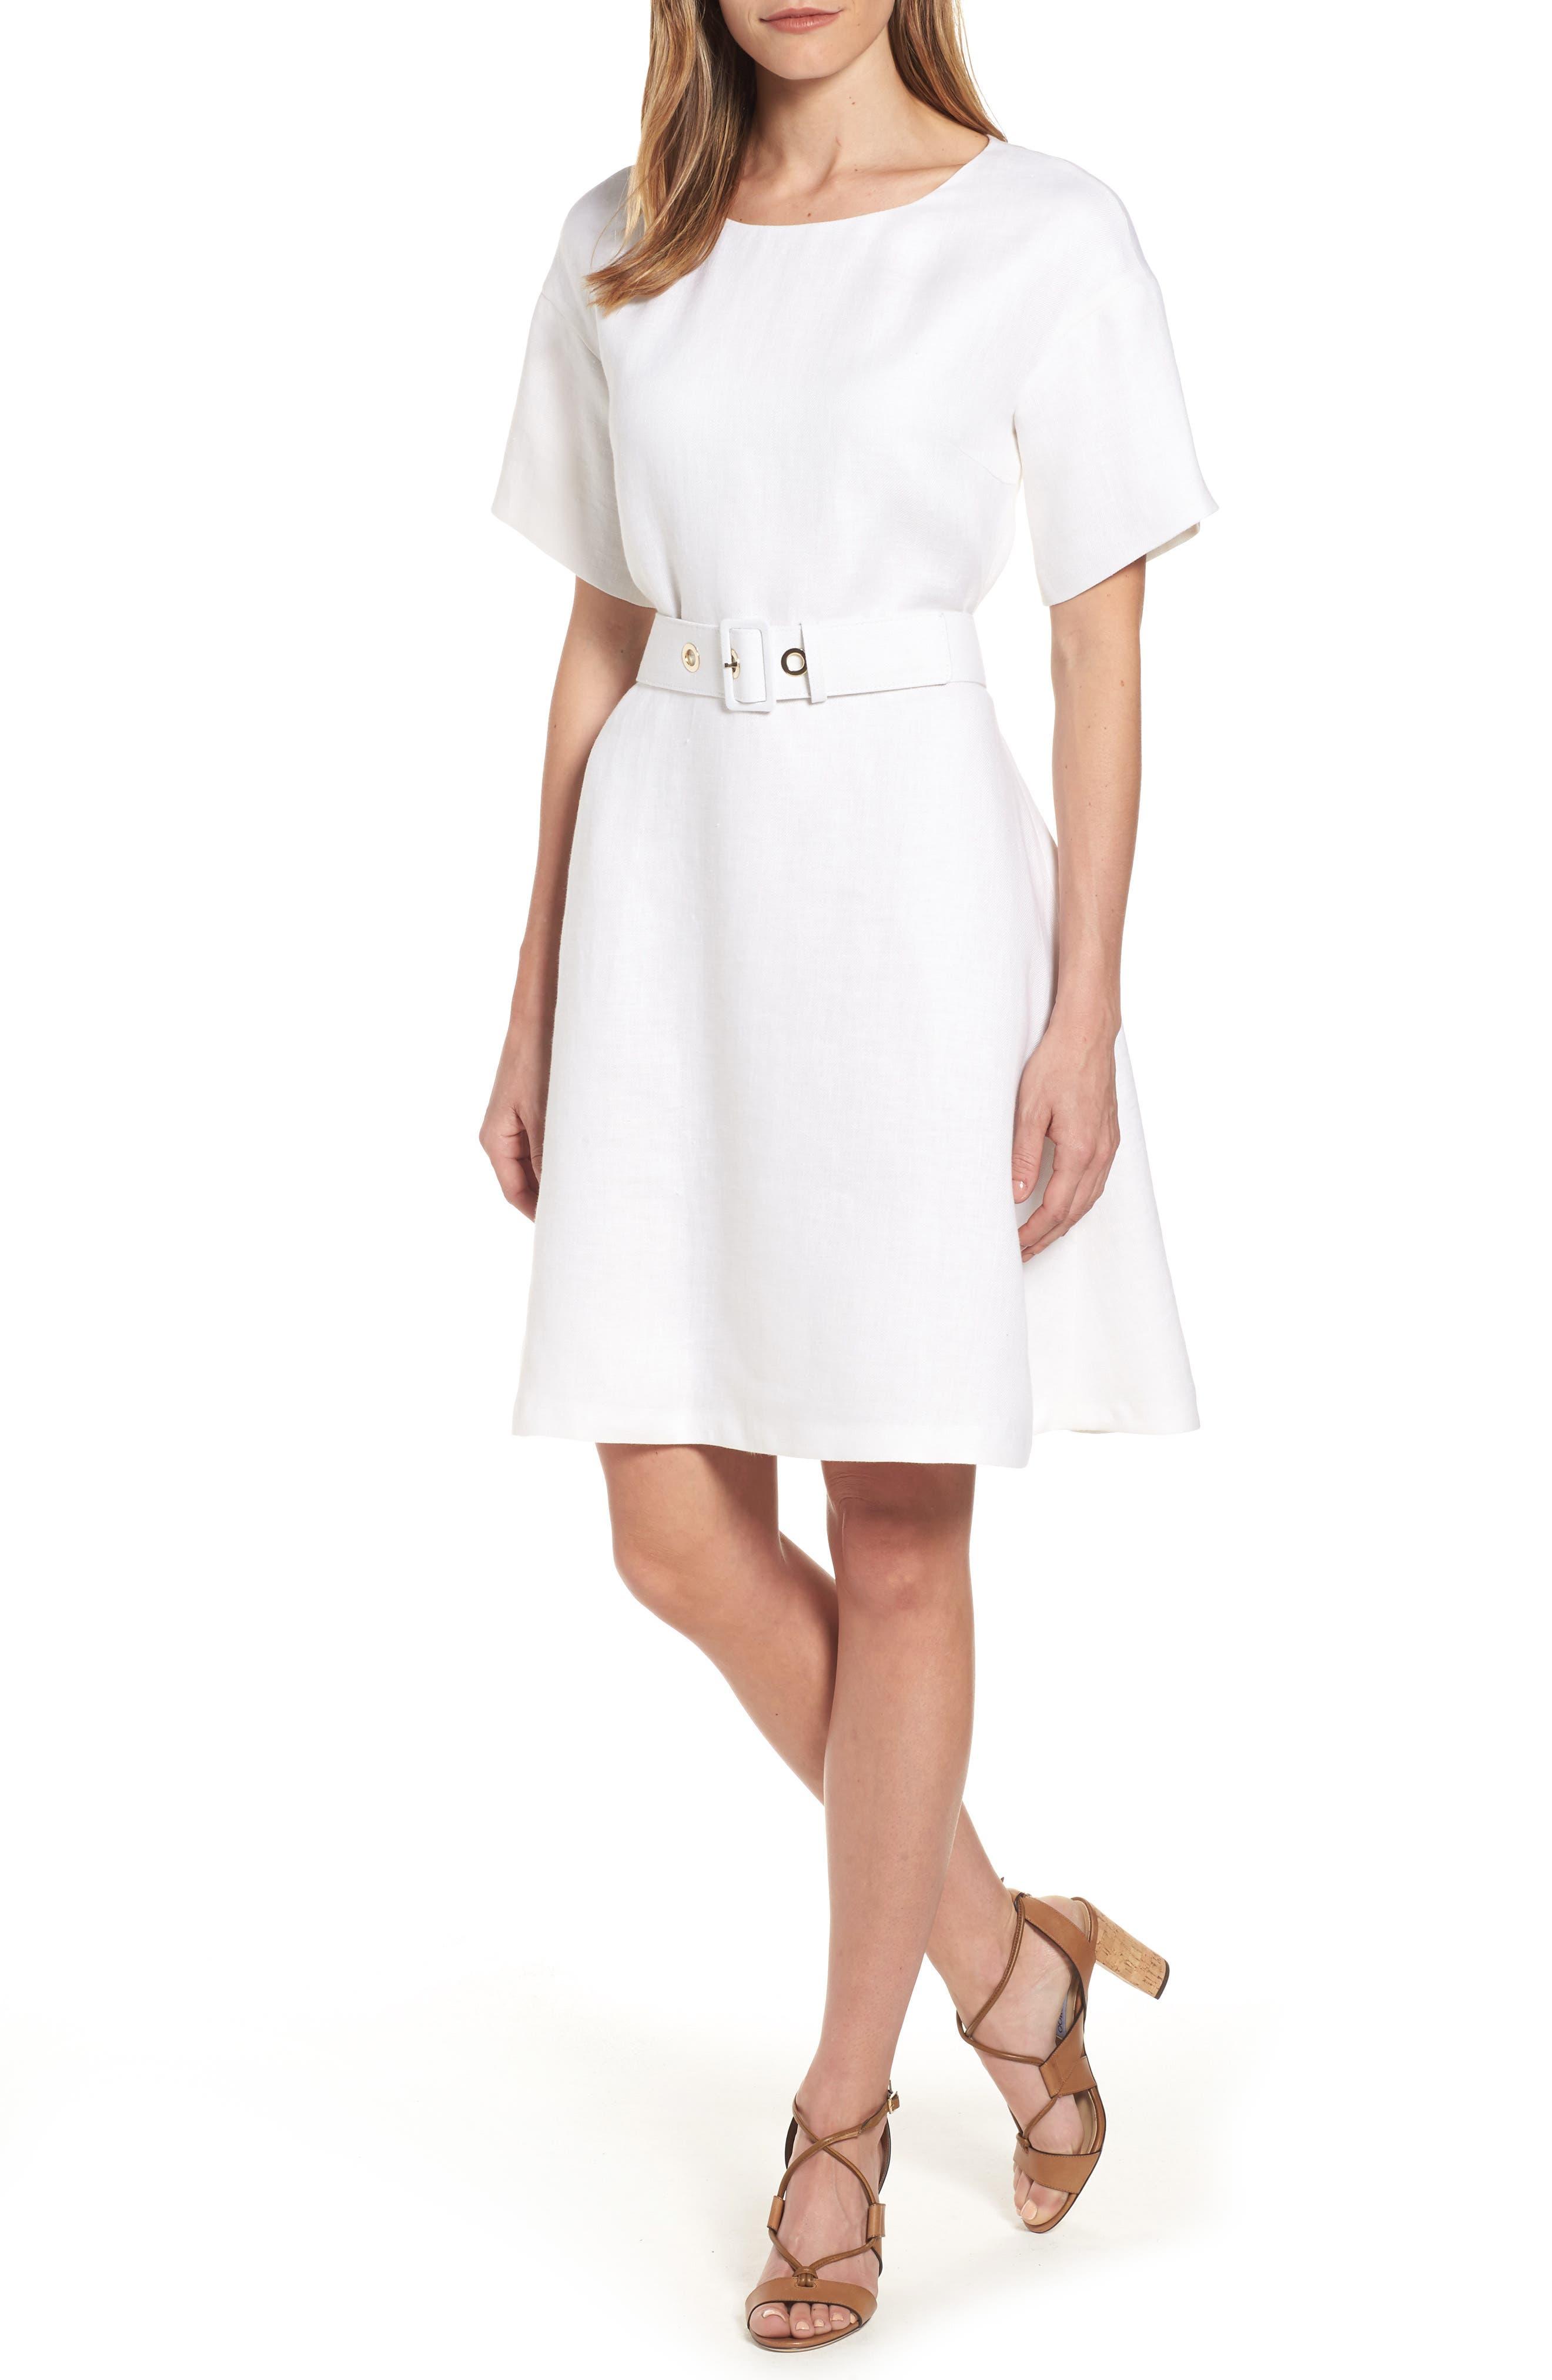 Dimisa Linen Belted A-Line Dress,                         Main,                         color, White